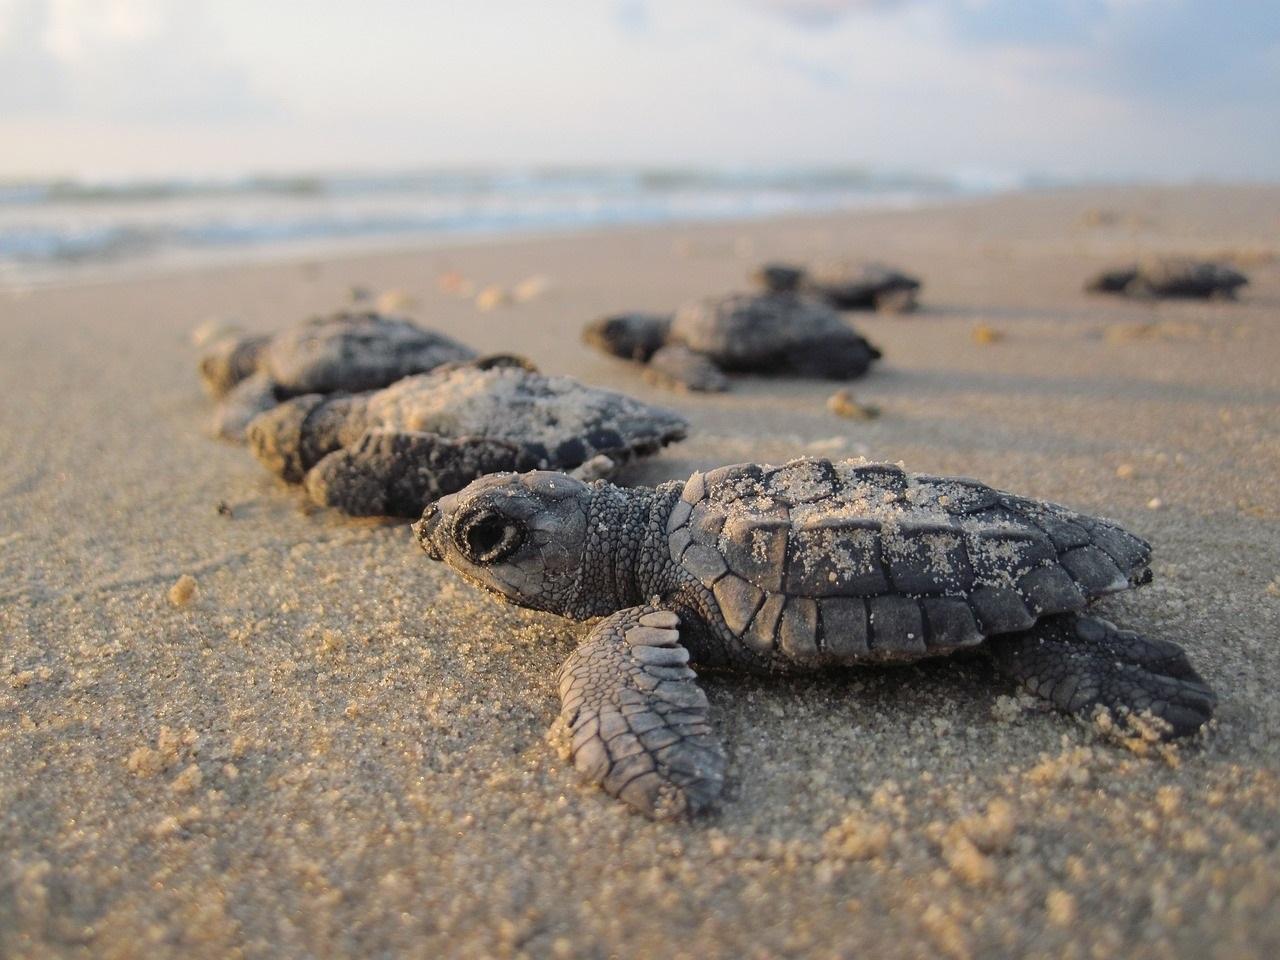 MIDTOWN PALM BEACH GARDENS FLORIDA